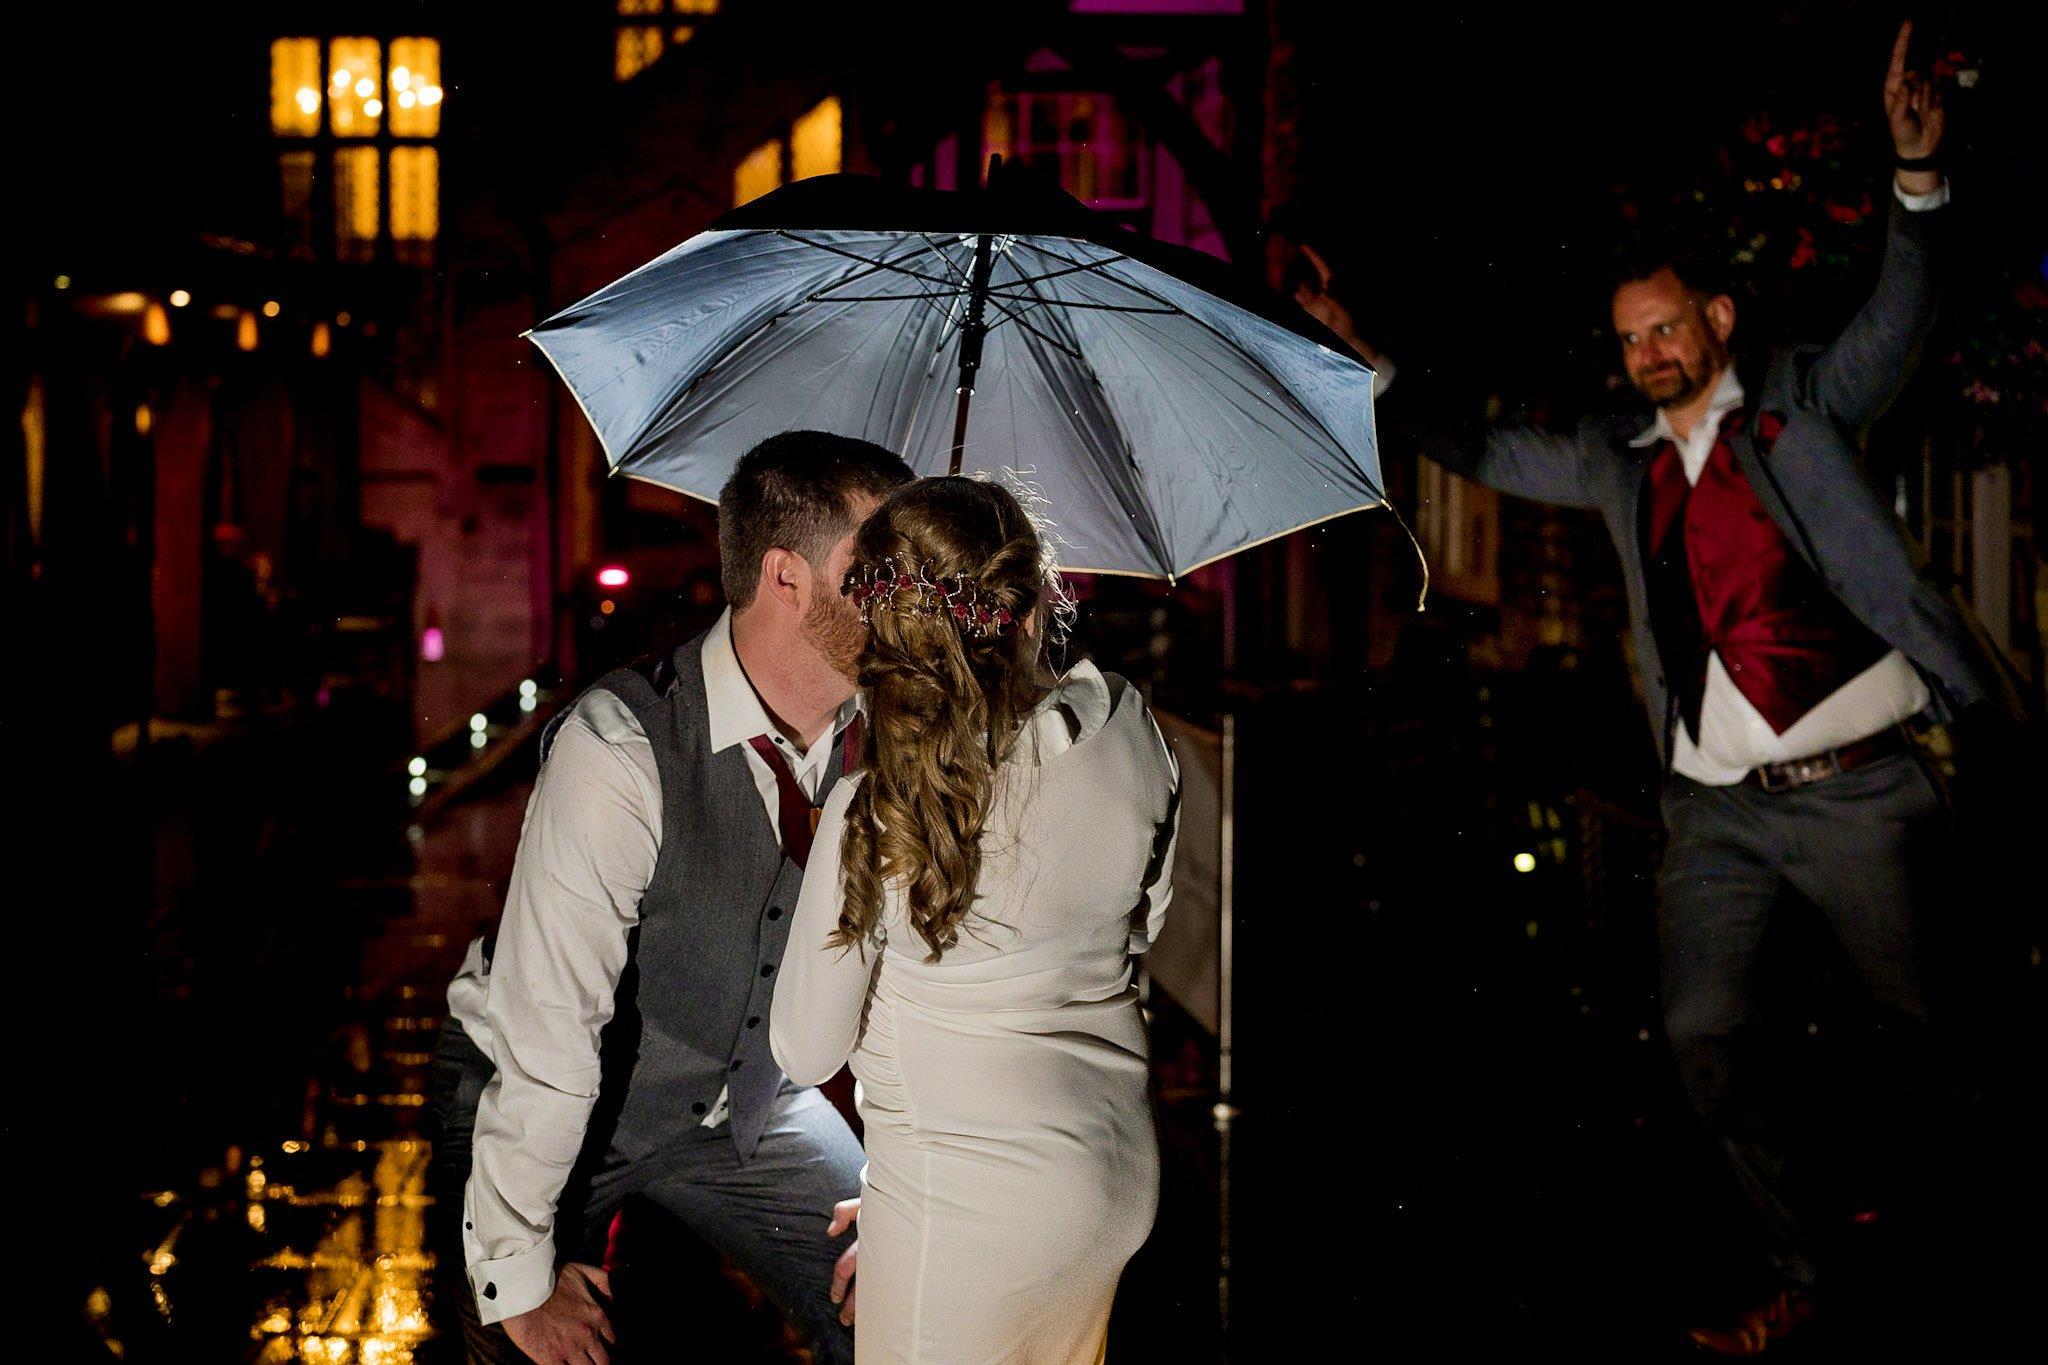 YFFUK Your Favourite Frame Talbot Hotel Oundle bridesman photobombing the couple during night photos umbrella rain